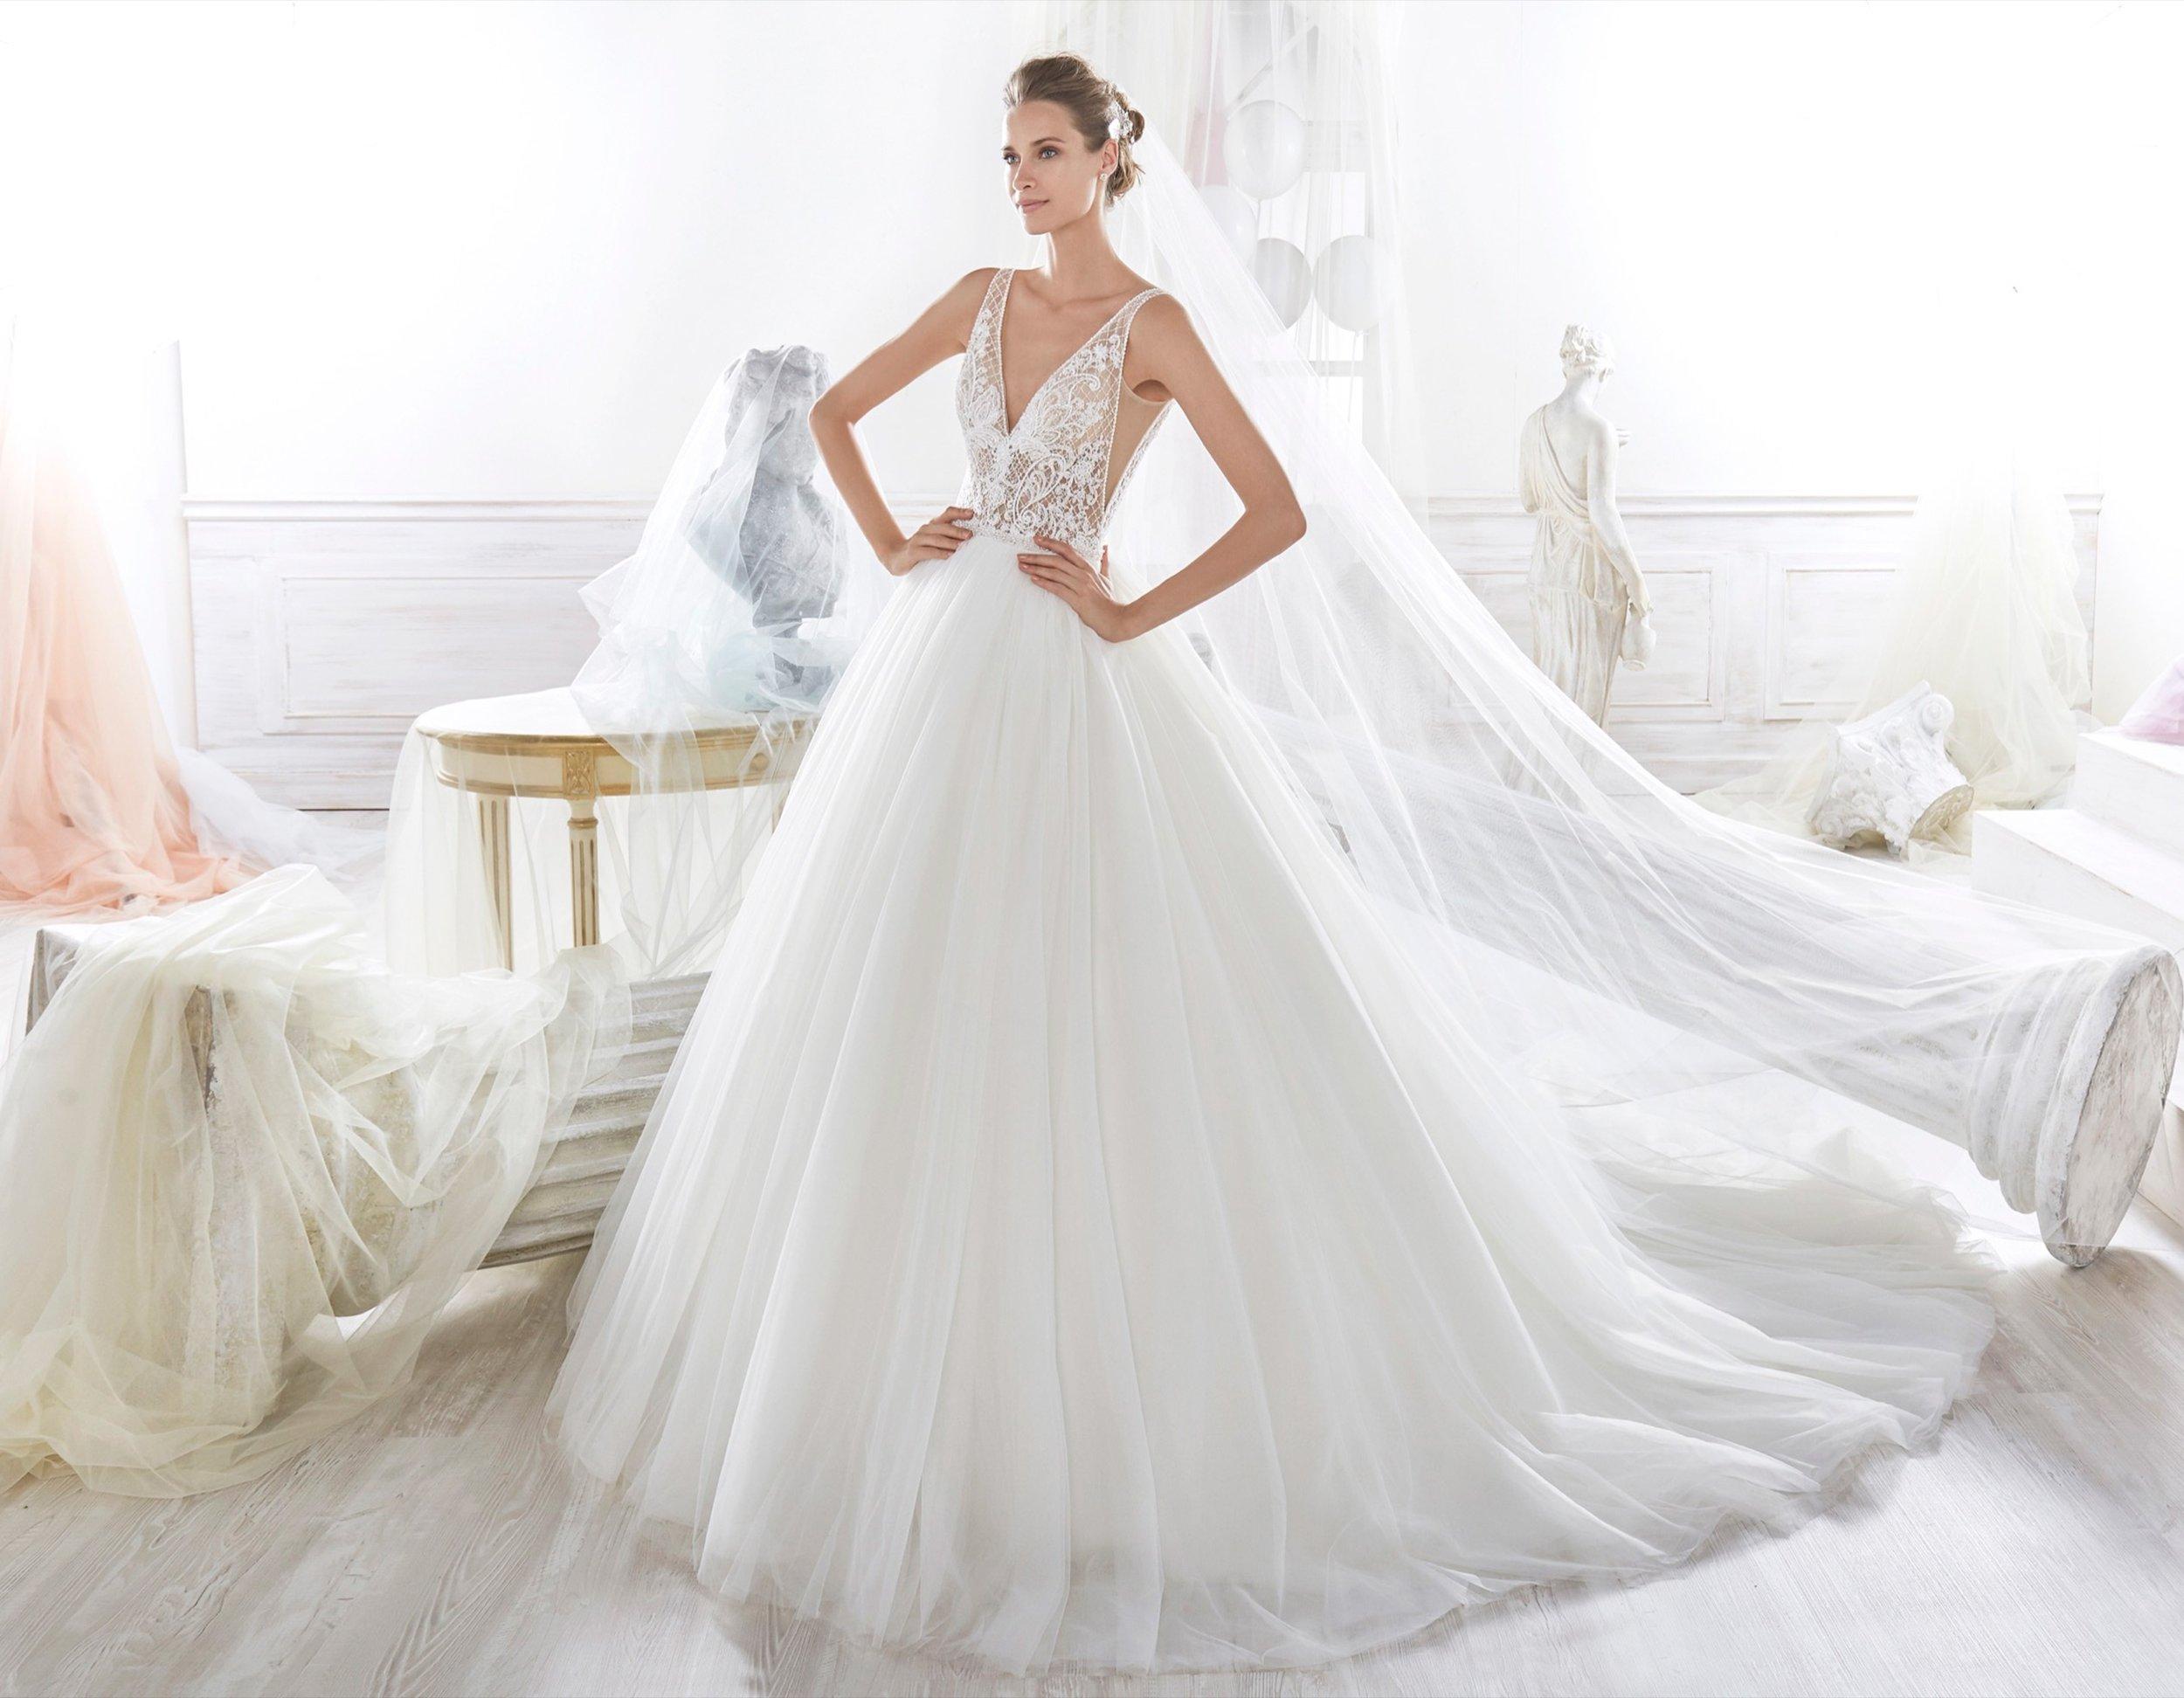 nicole-spose-NIAB18009-Nicole-moda-sposa-2018-955.jpg